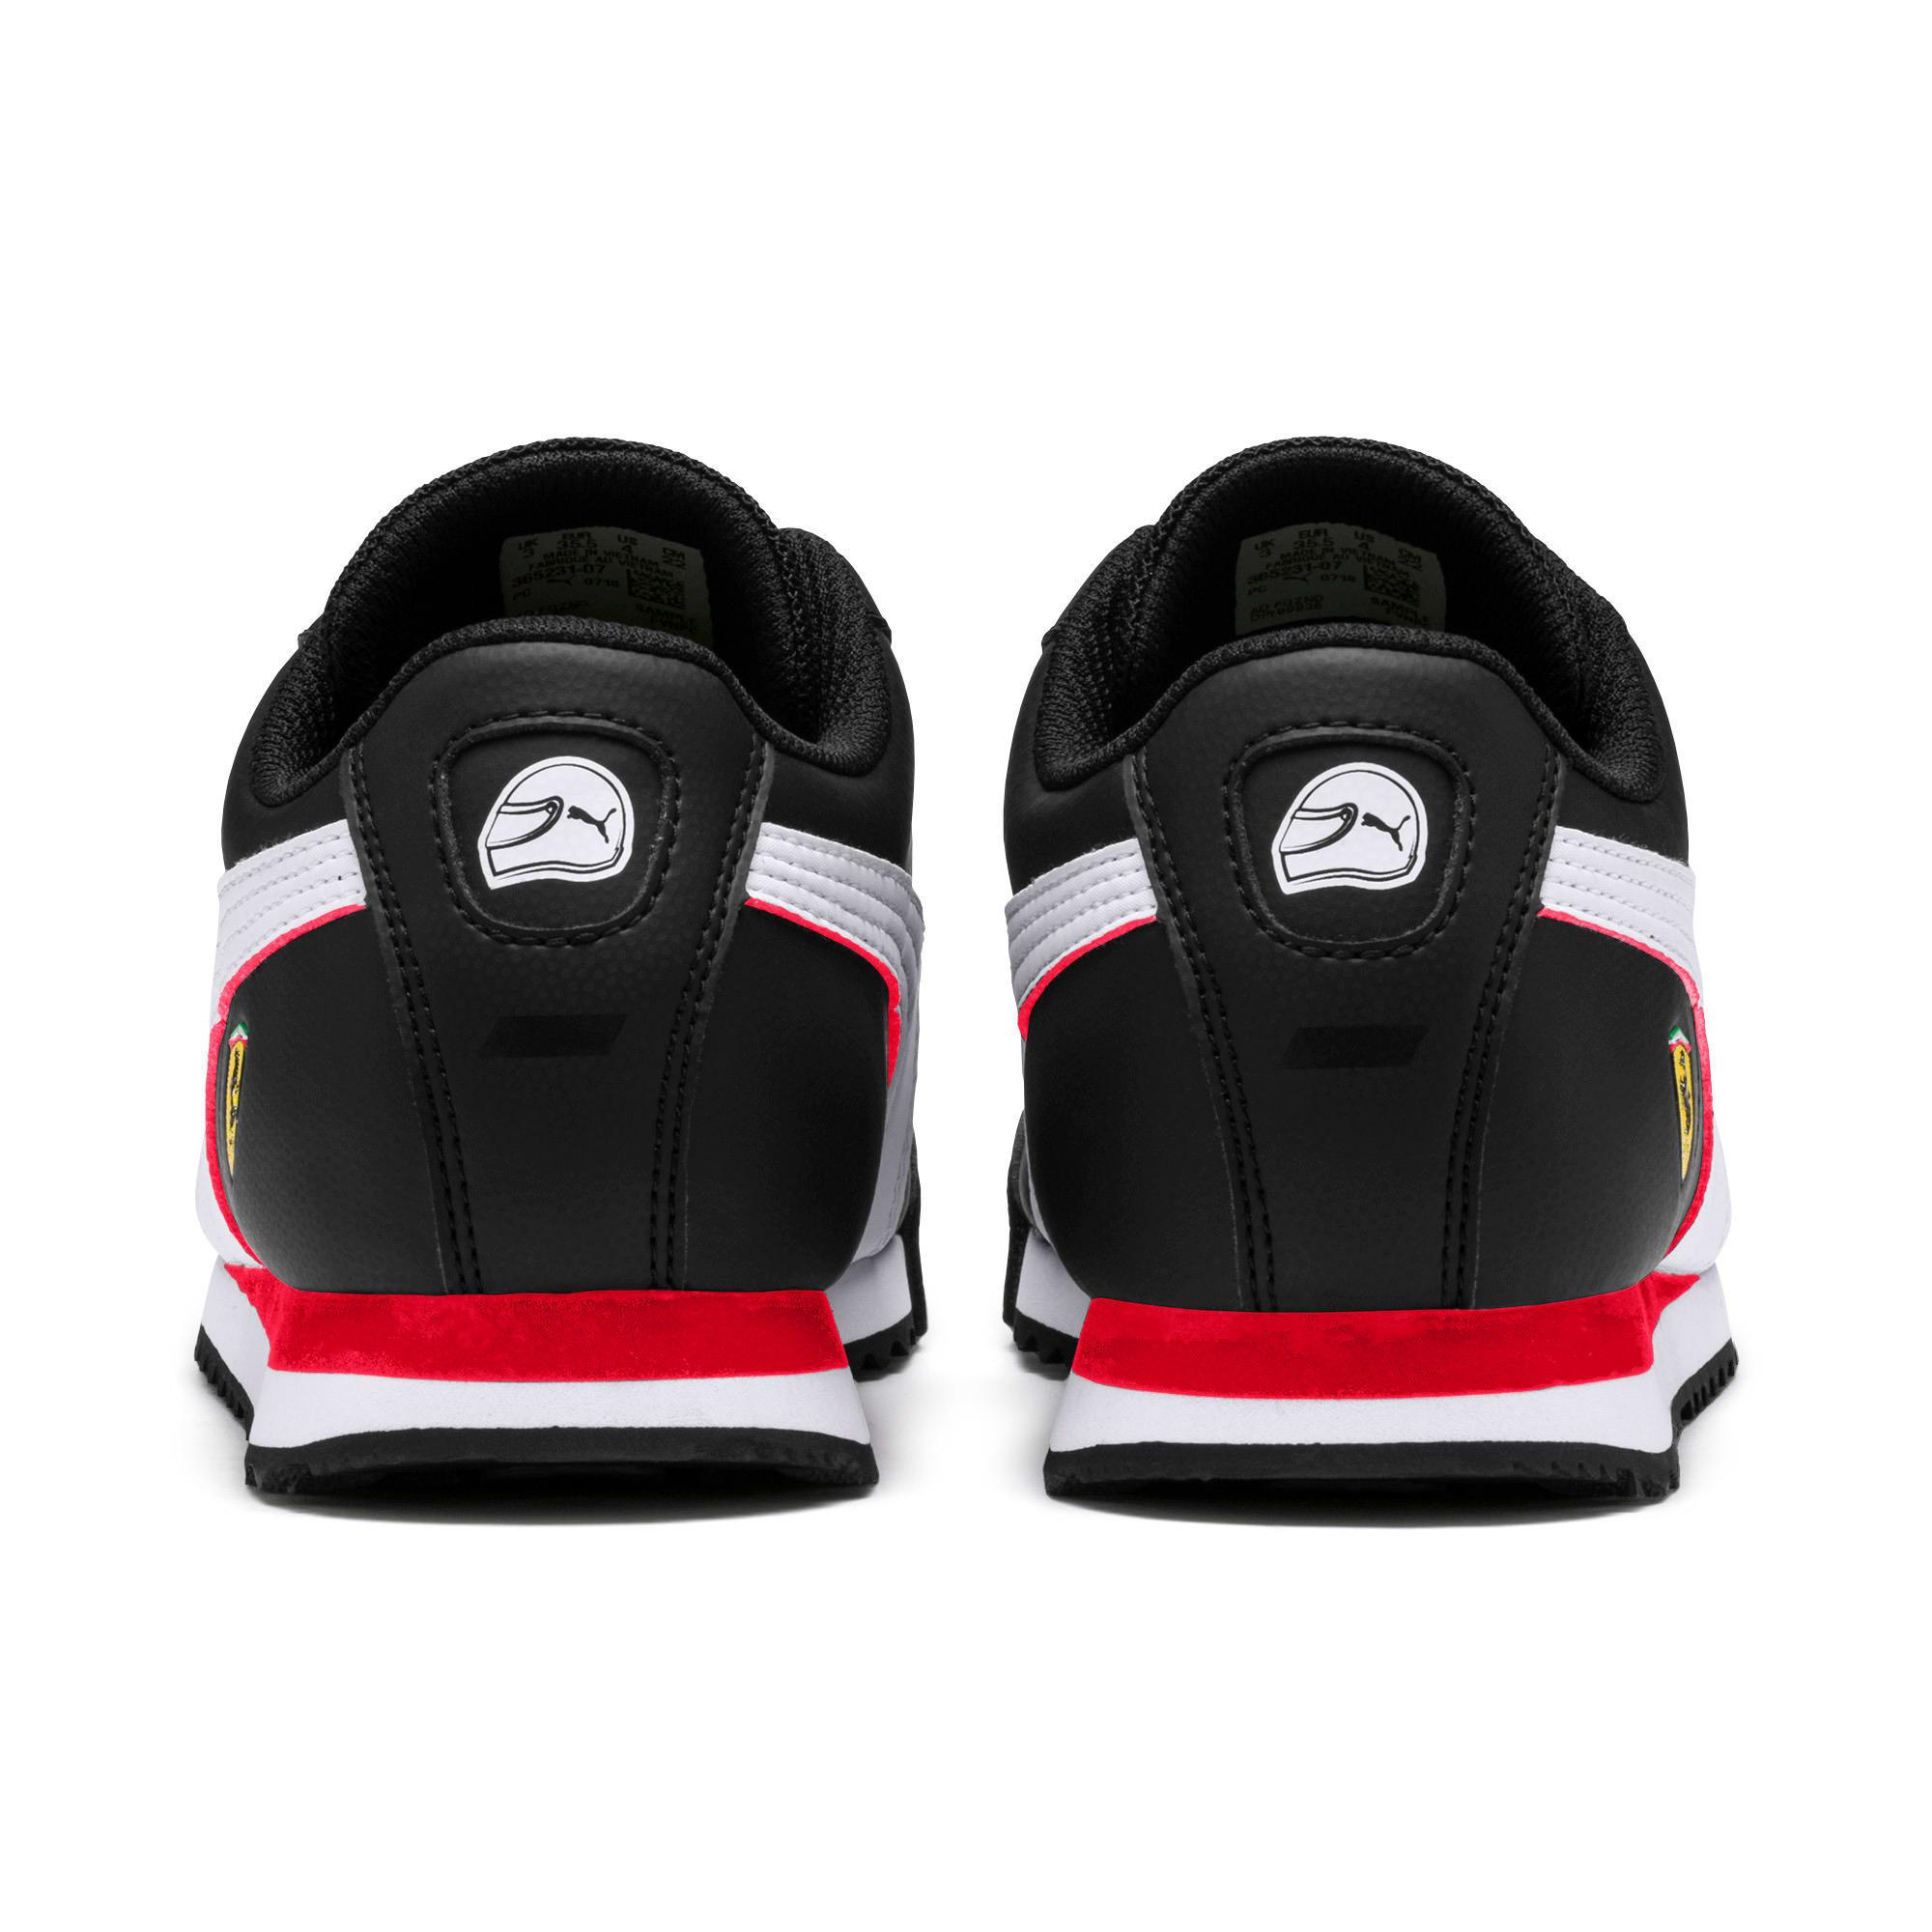 Thumbnail 4 of Scuderia Ferrari Roma Sneakers JR, Black-White-Rosso Corsa, medium